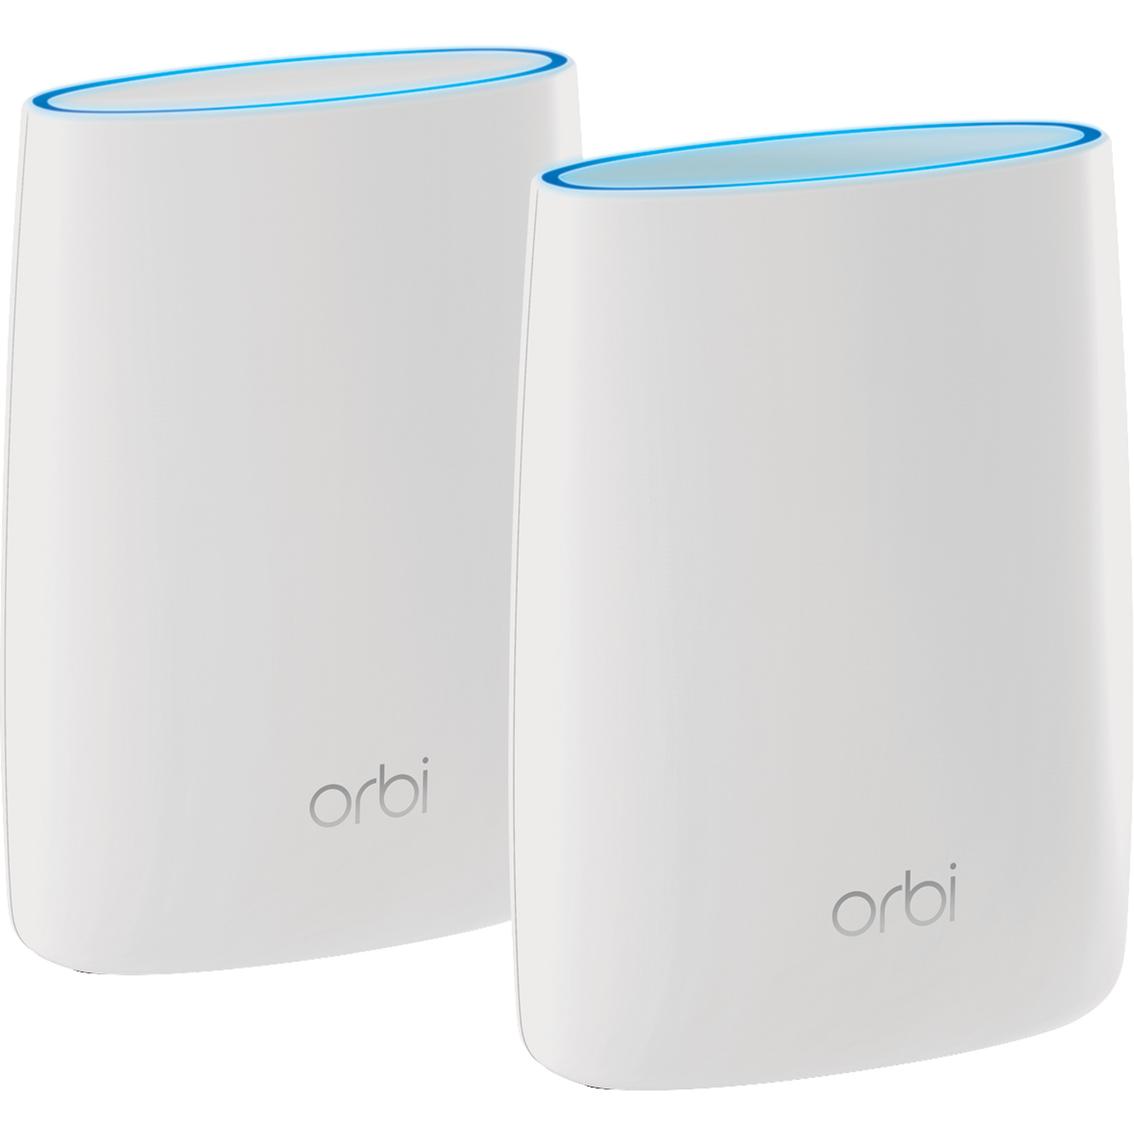 Netgear Orbi High Performance Ac3000 Tri Band Wifi System